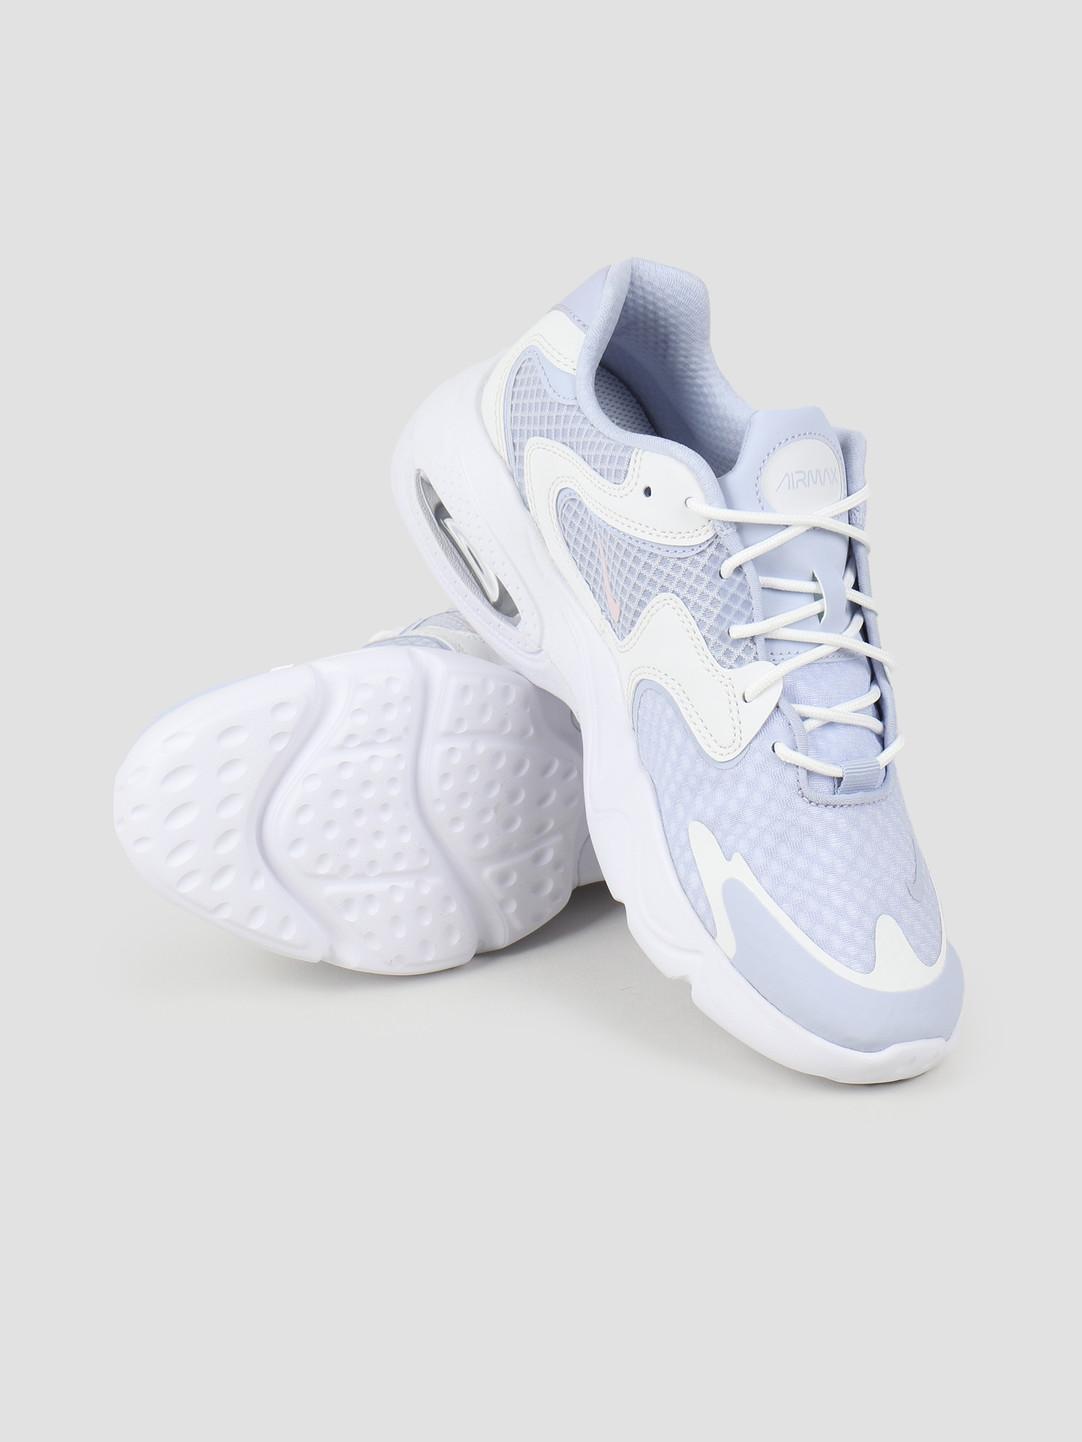 Nike Nike W Air Max 2X Ghost Barely Rose-Summit White-White CK2947-002